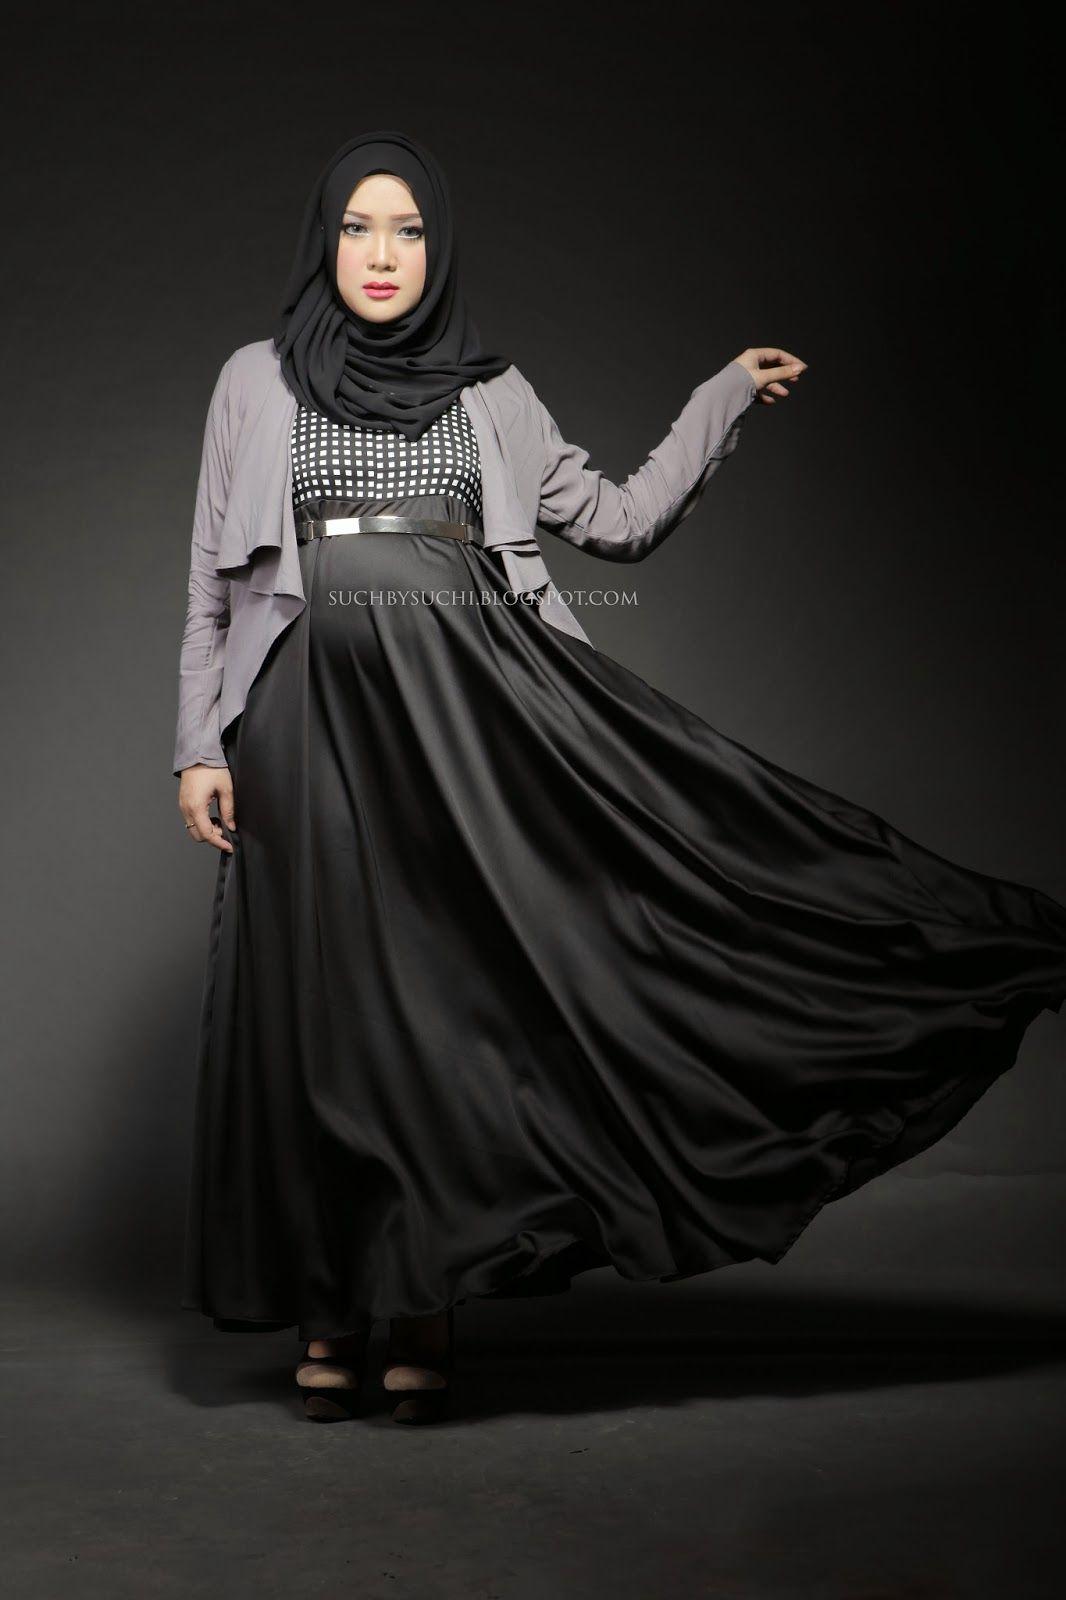 Model Baju Pesta Untuk Ibu Hamil 6 Bulan